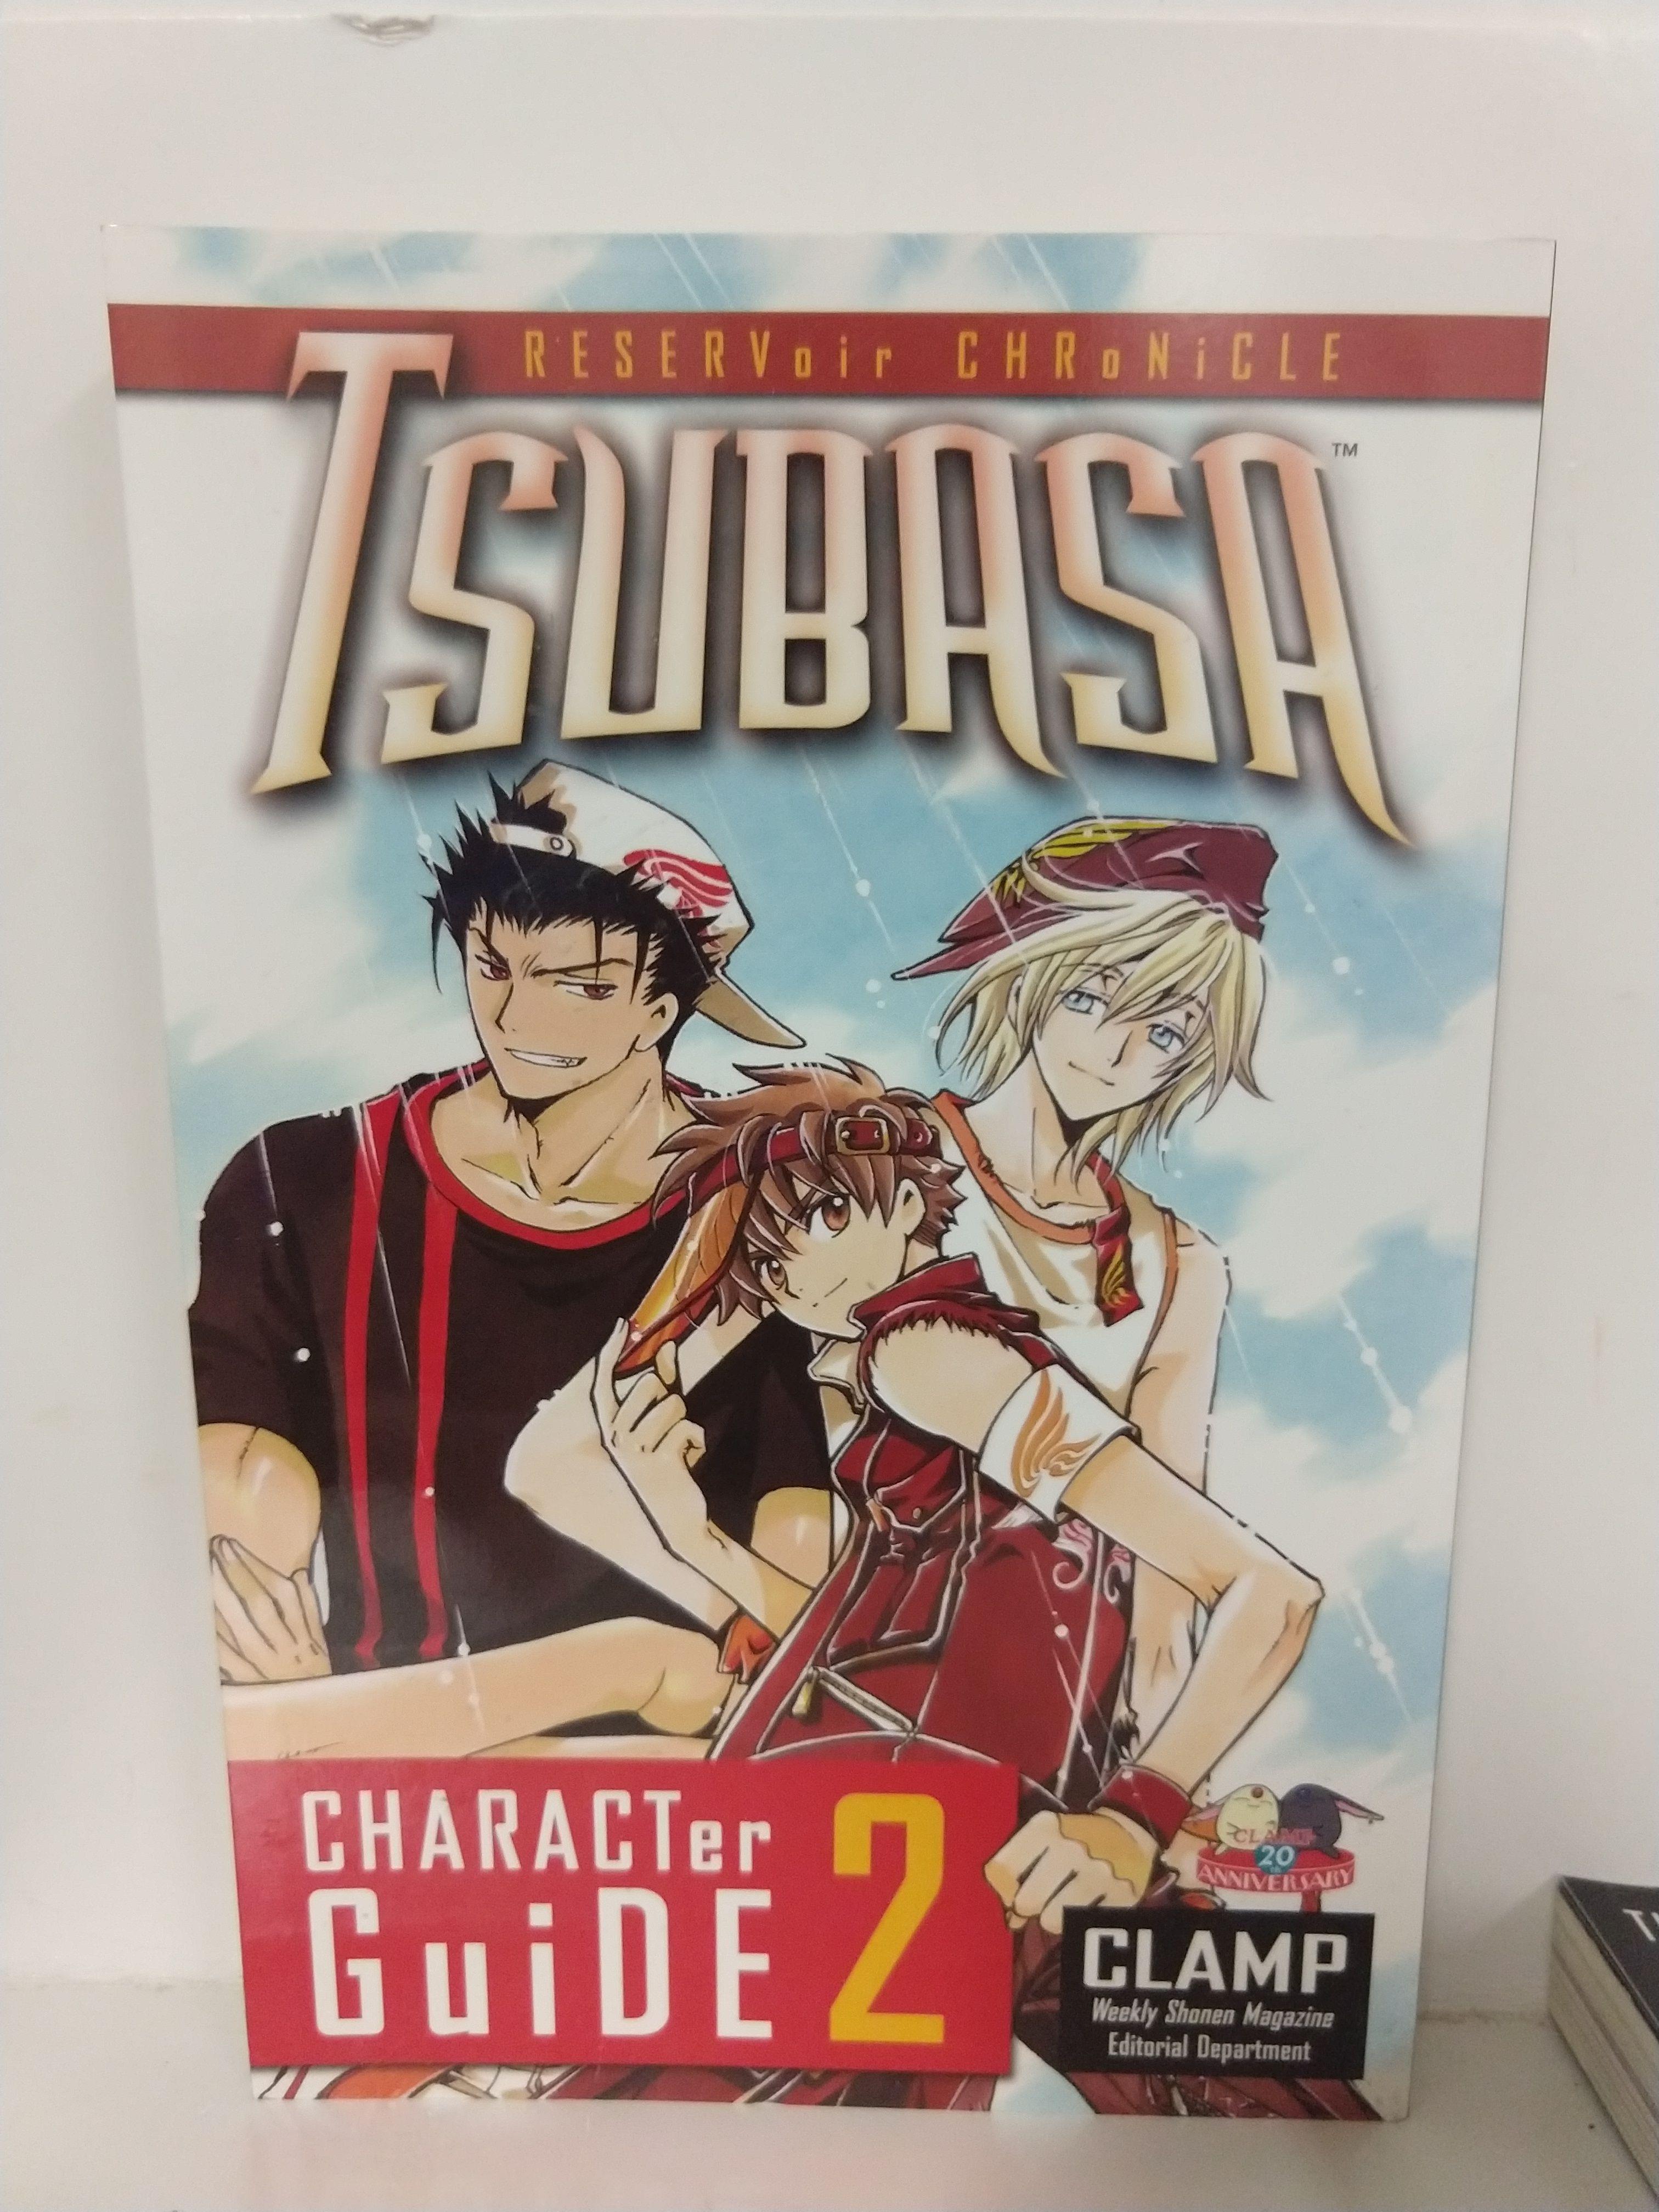 Image for Tsubasa Character Guide 2